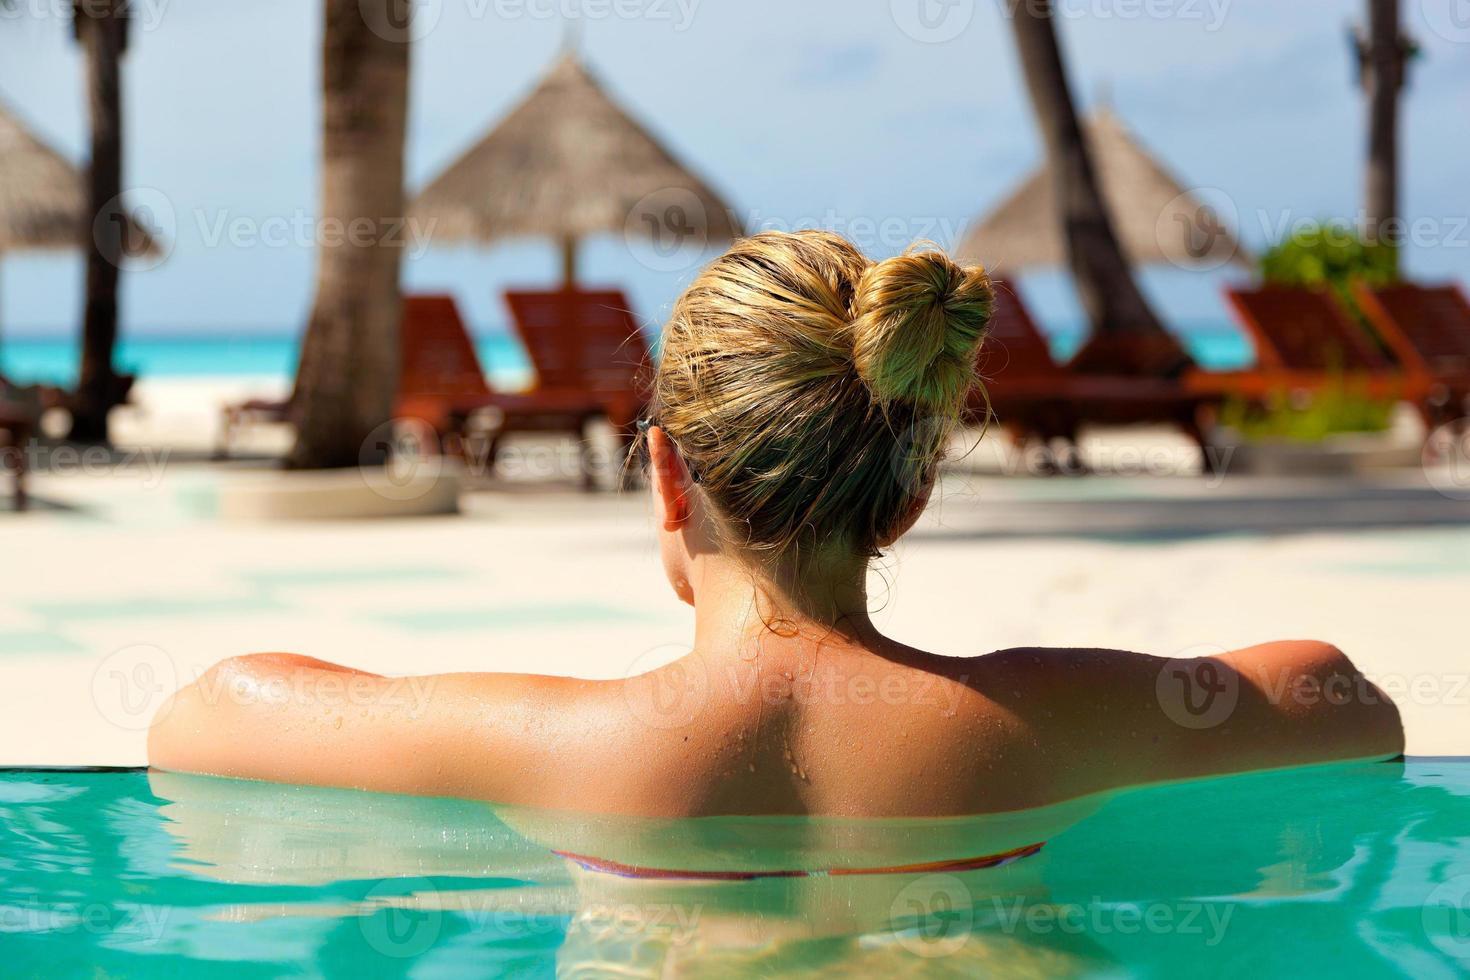 garota na piscina no paraíso resort foto